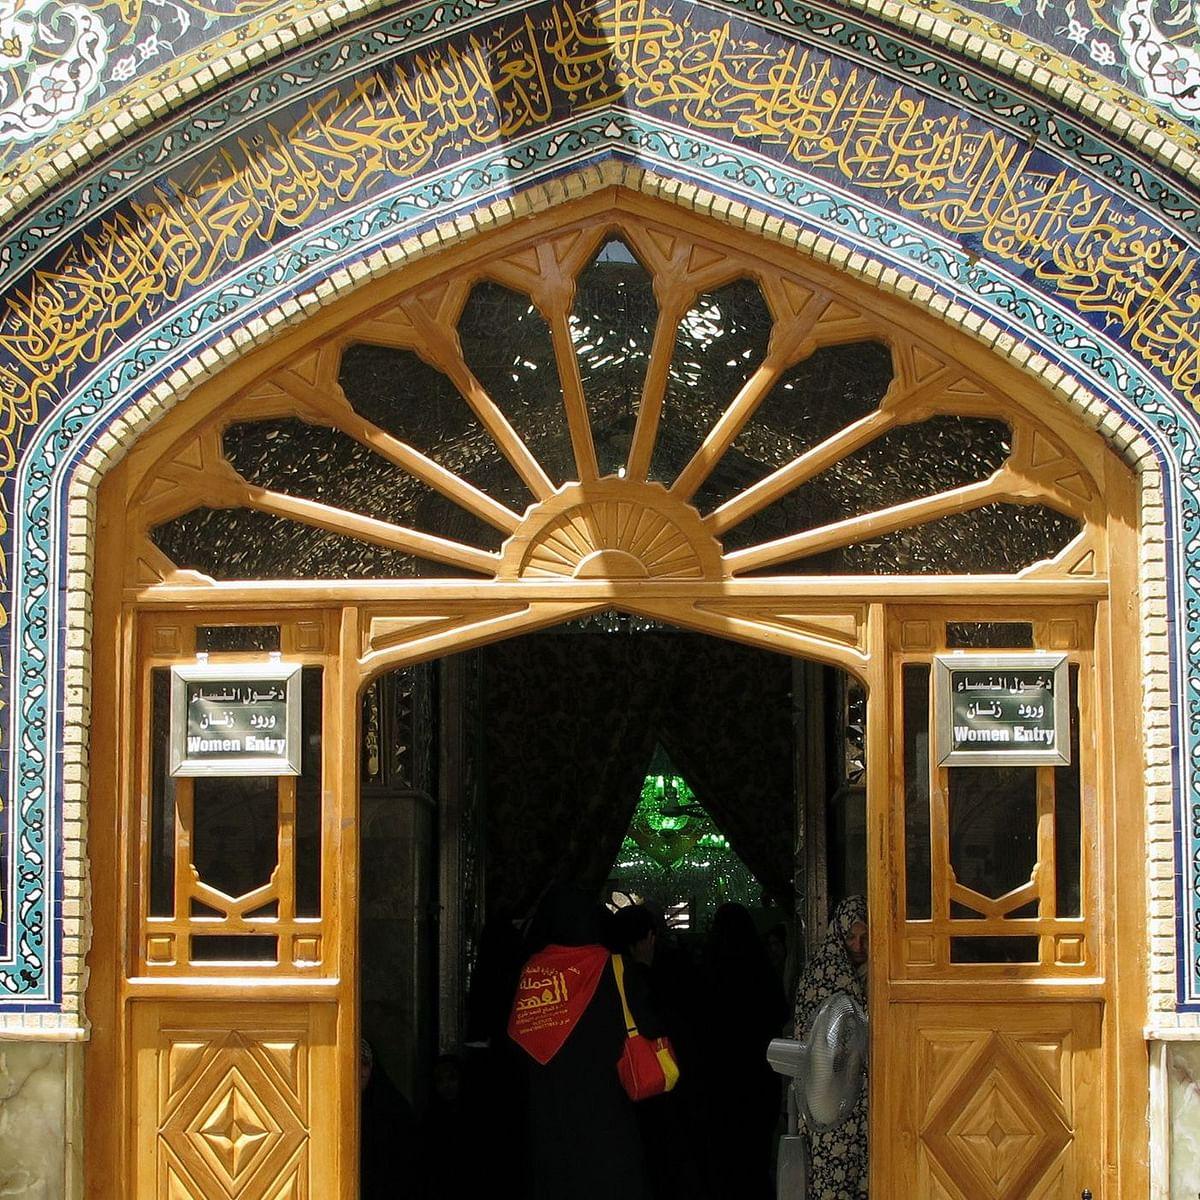 روزہ حضرت علی / Getty Images